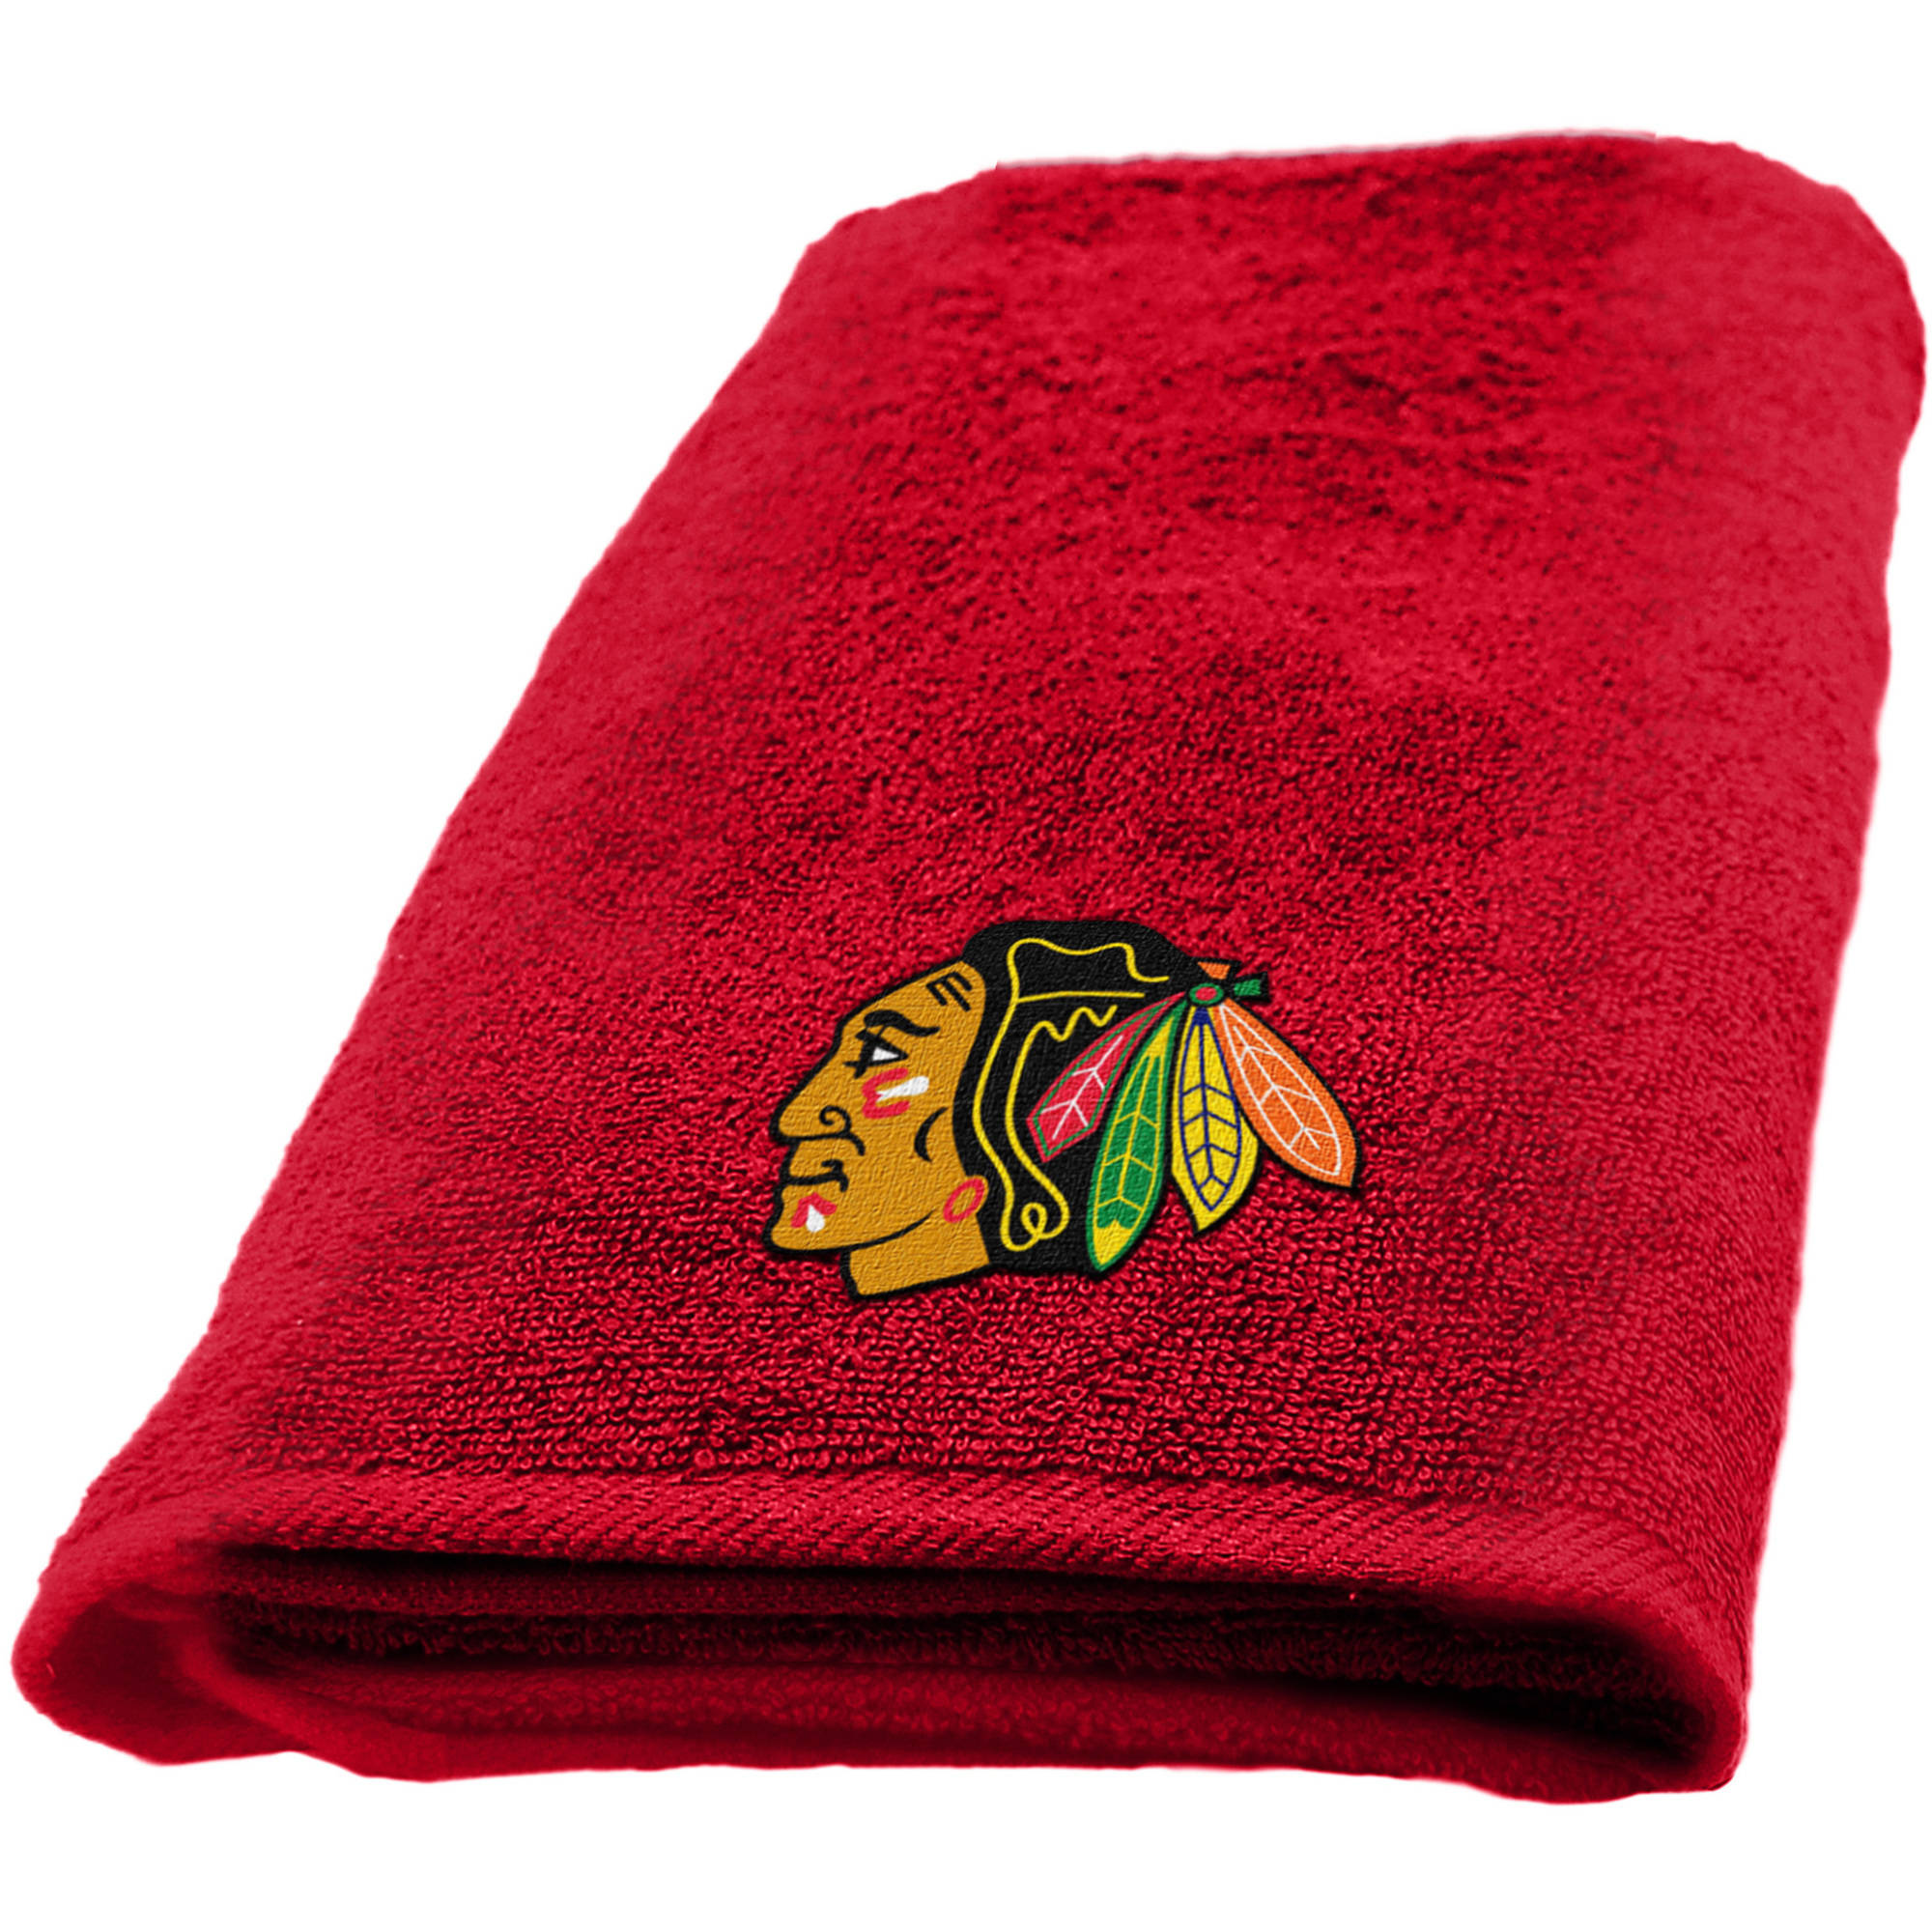 "NHL Chicago Blackhawks 15"" x 26"" Applique Hand Towel, 1 Each"